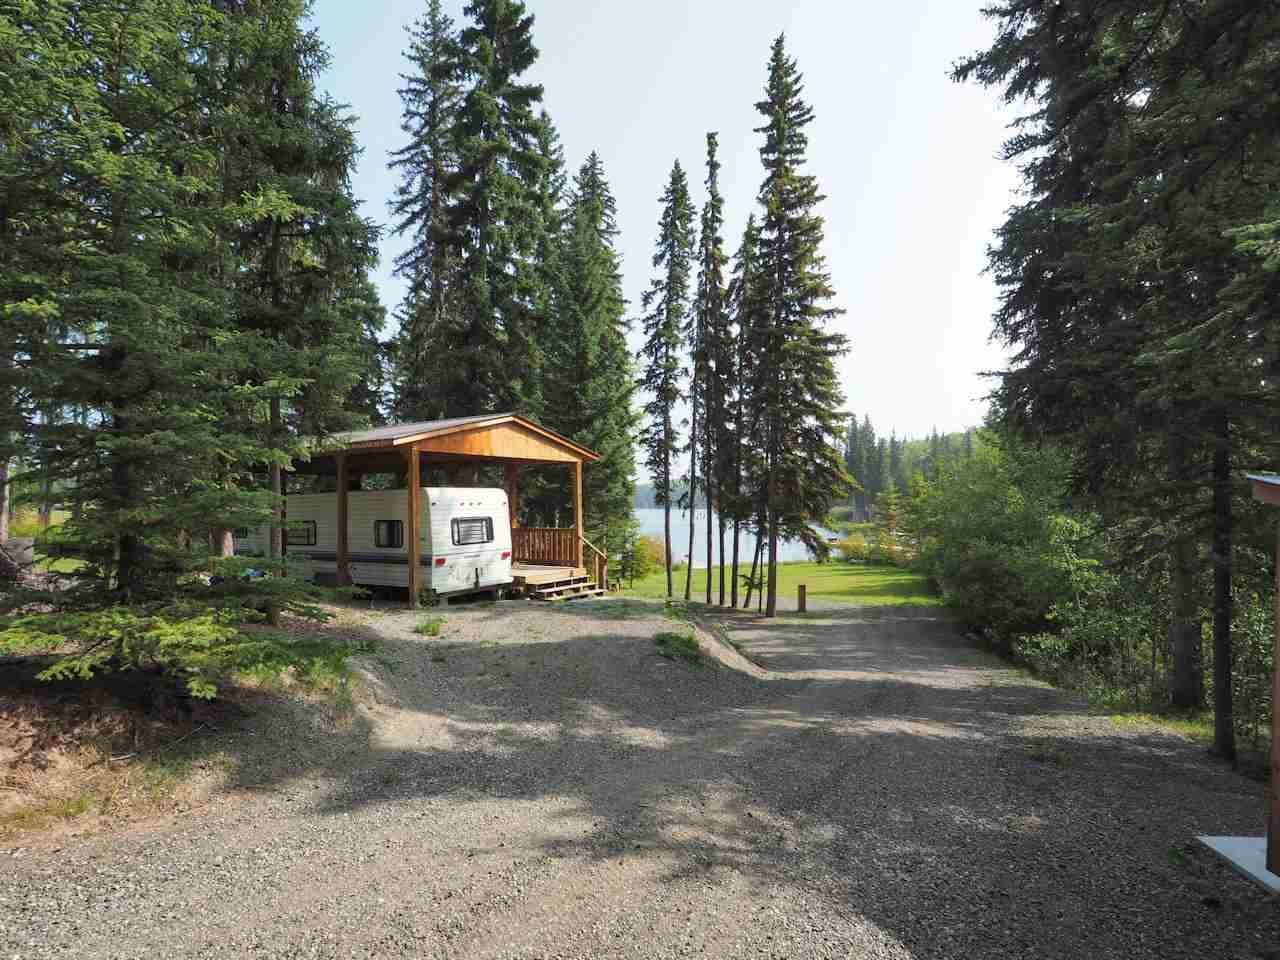 Photo 13: Photos: 7271 NATH Road in Bridge Lake: Bridge Lake/Sheridan Lake Land for sale (100 Mile House (Zone 10))  : MLS®# R2496086